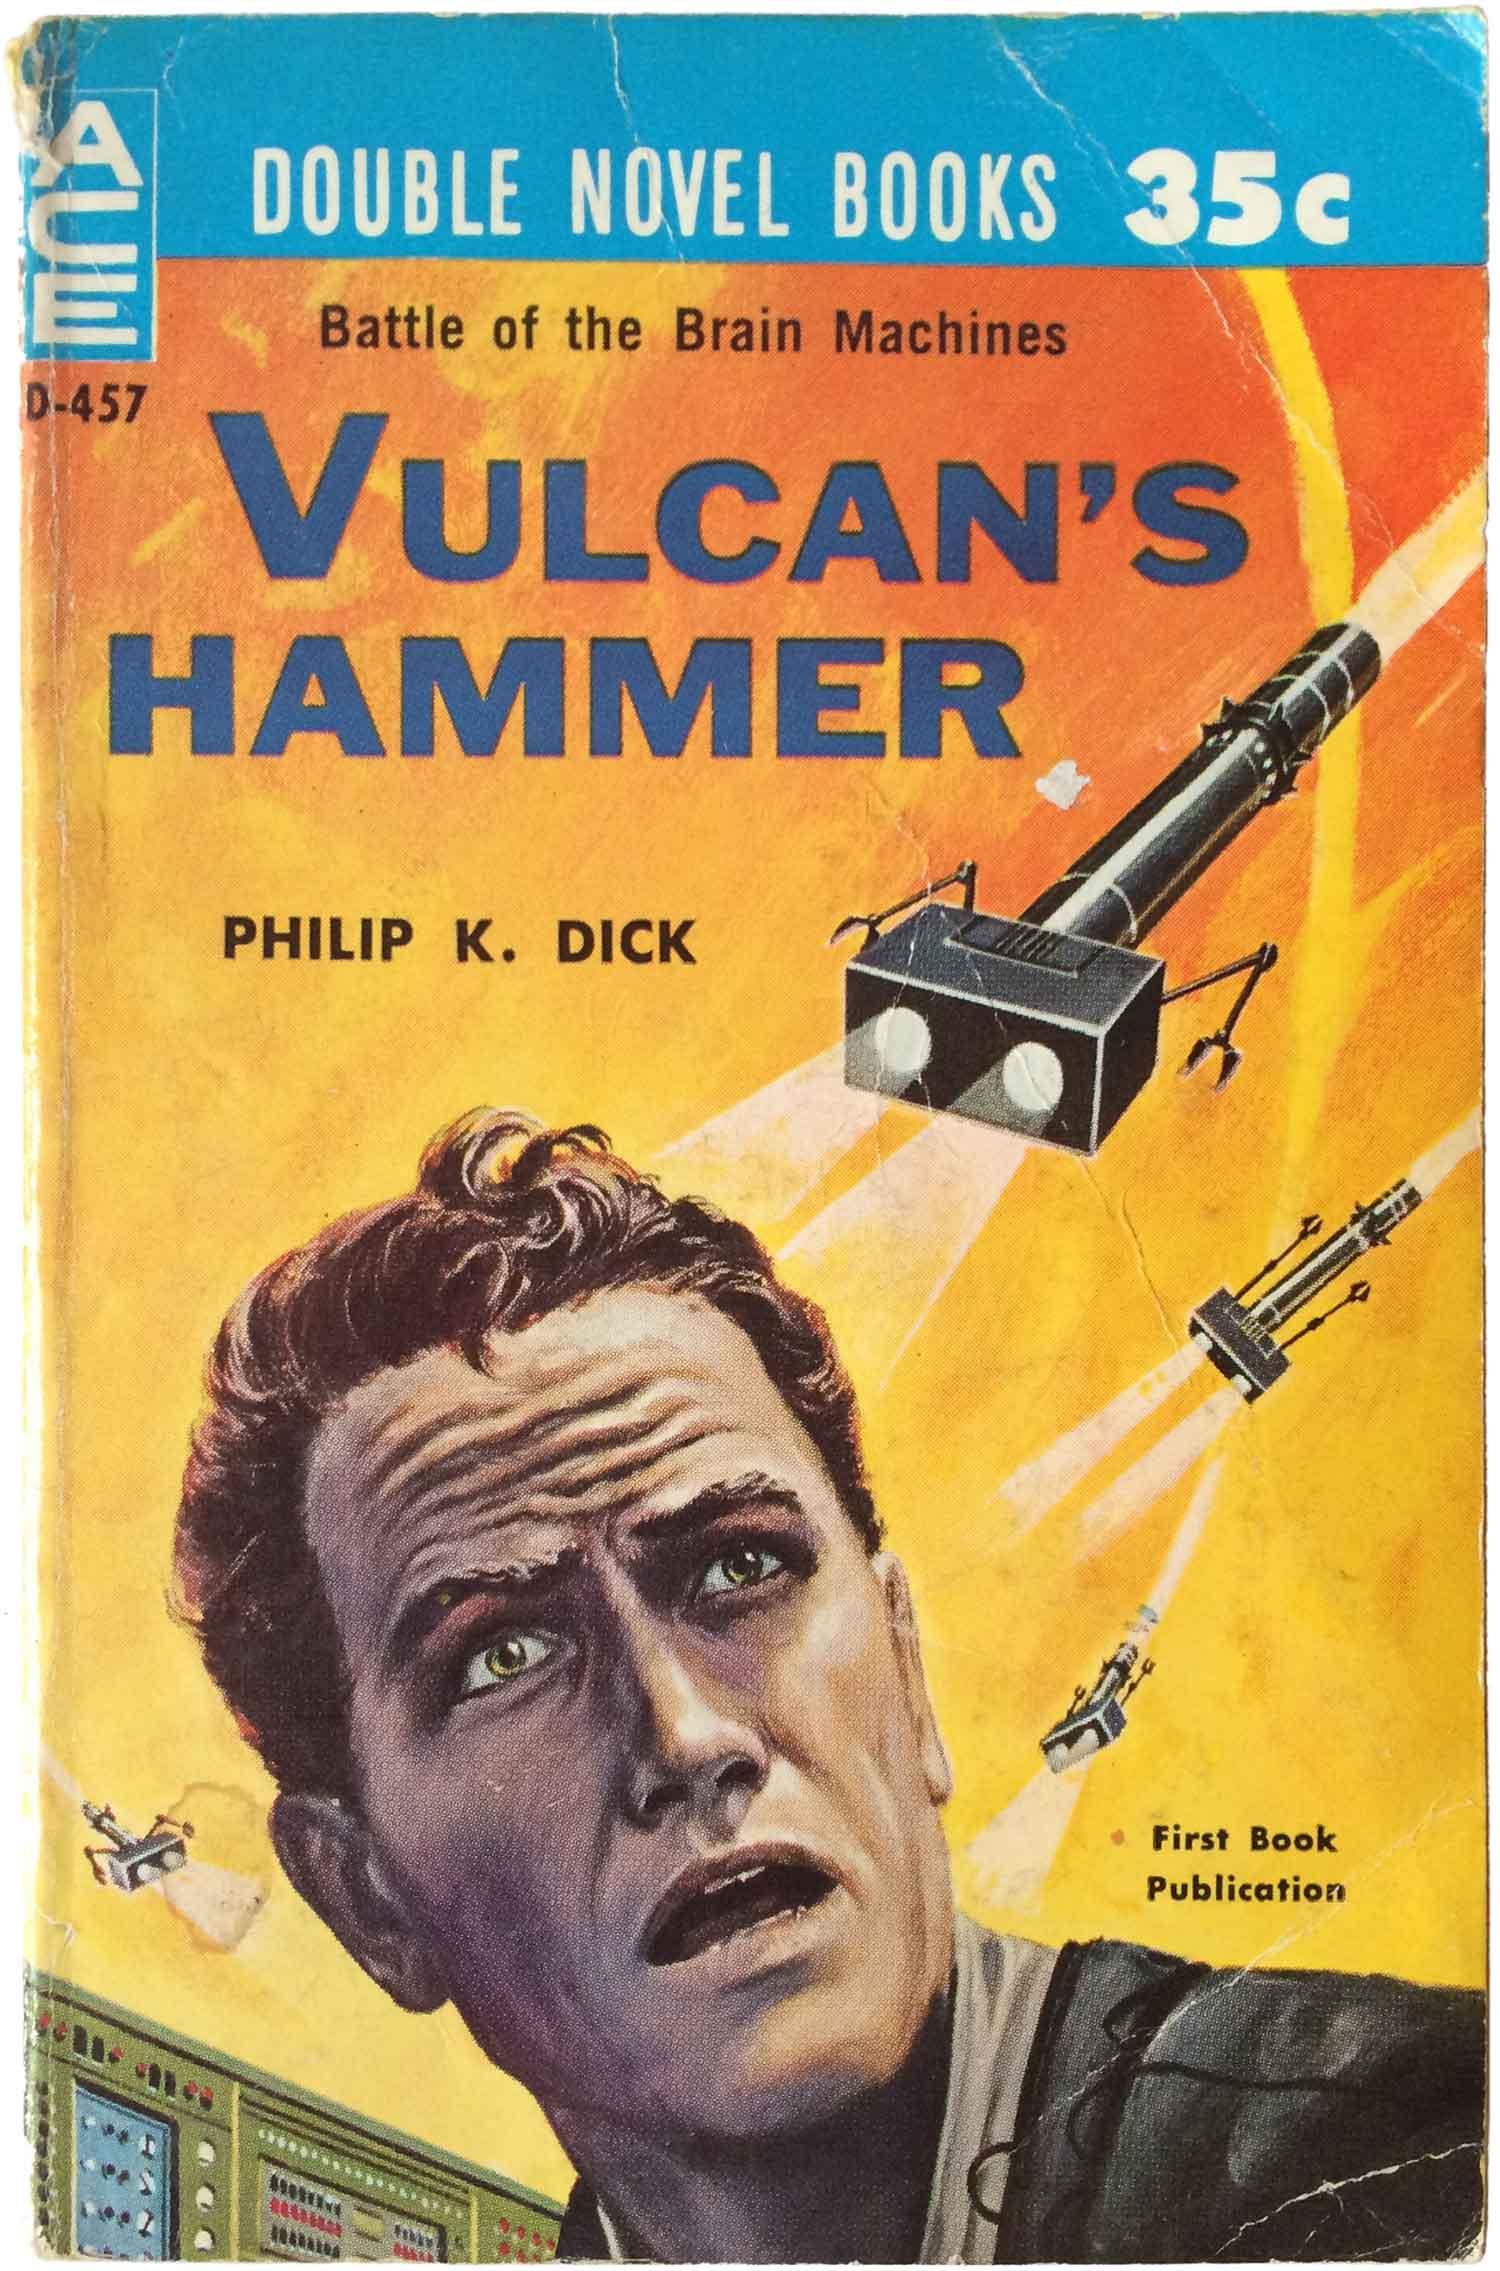 pkd_vulcanshammer_acedouble